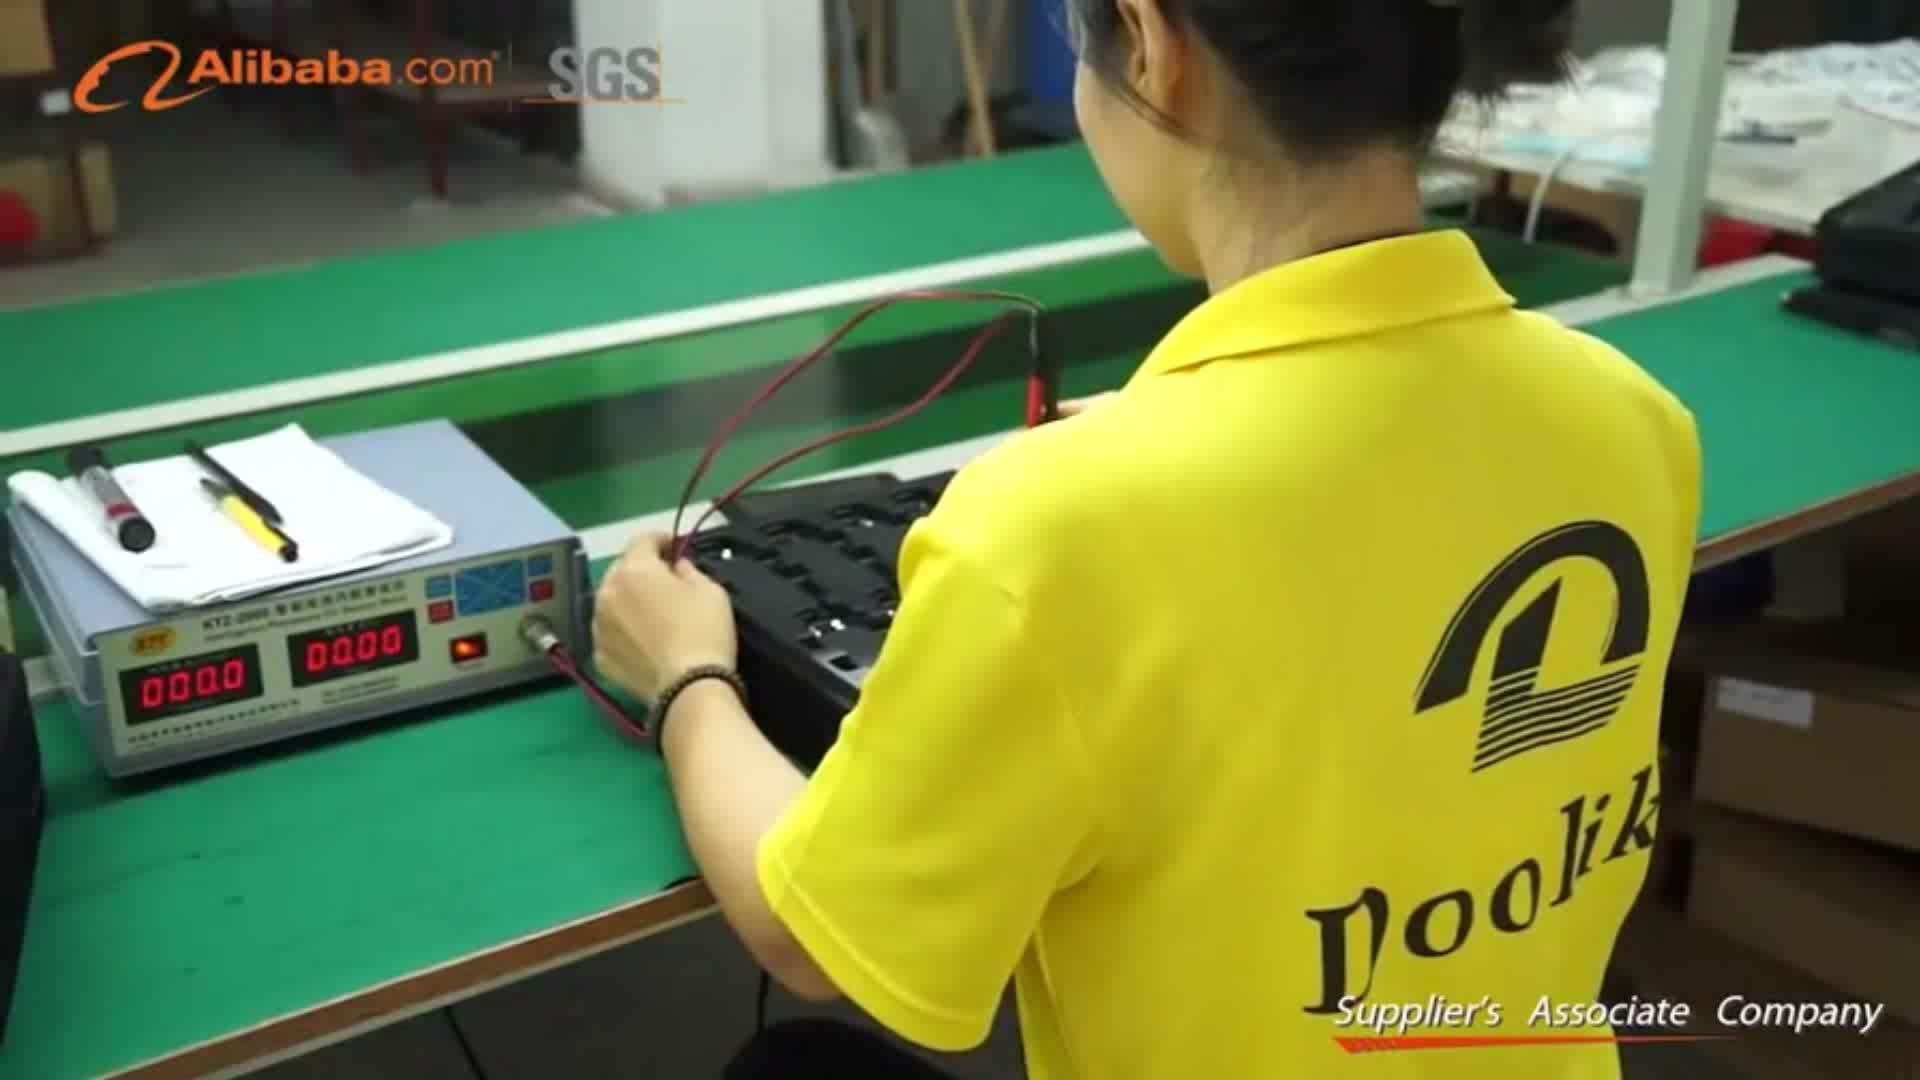 चीन मोबाइल फोन की बैटरी पैक प्रतिस्थापन के लिए मोटोरोला मोटो जी XT1031 1032 1033 1039